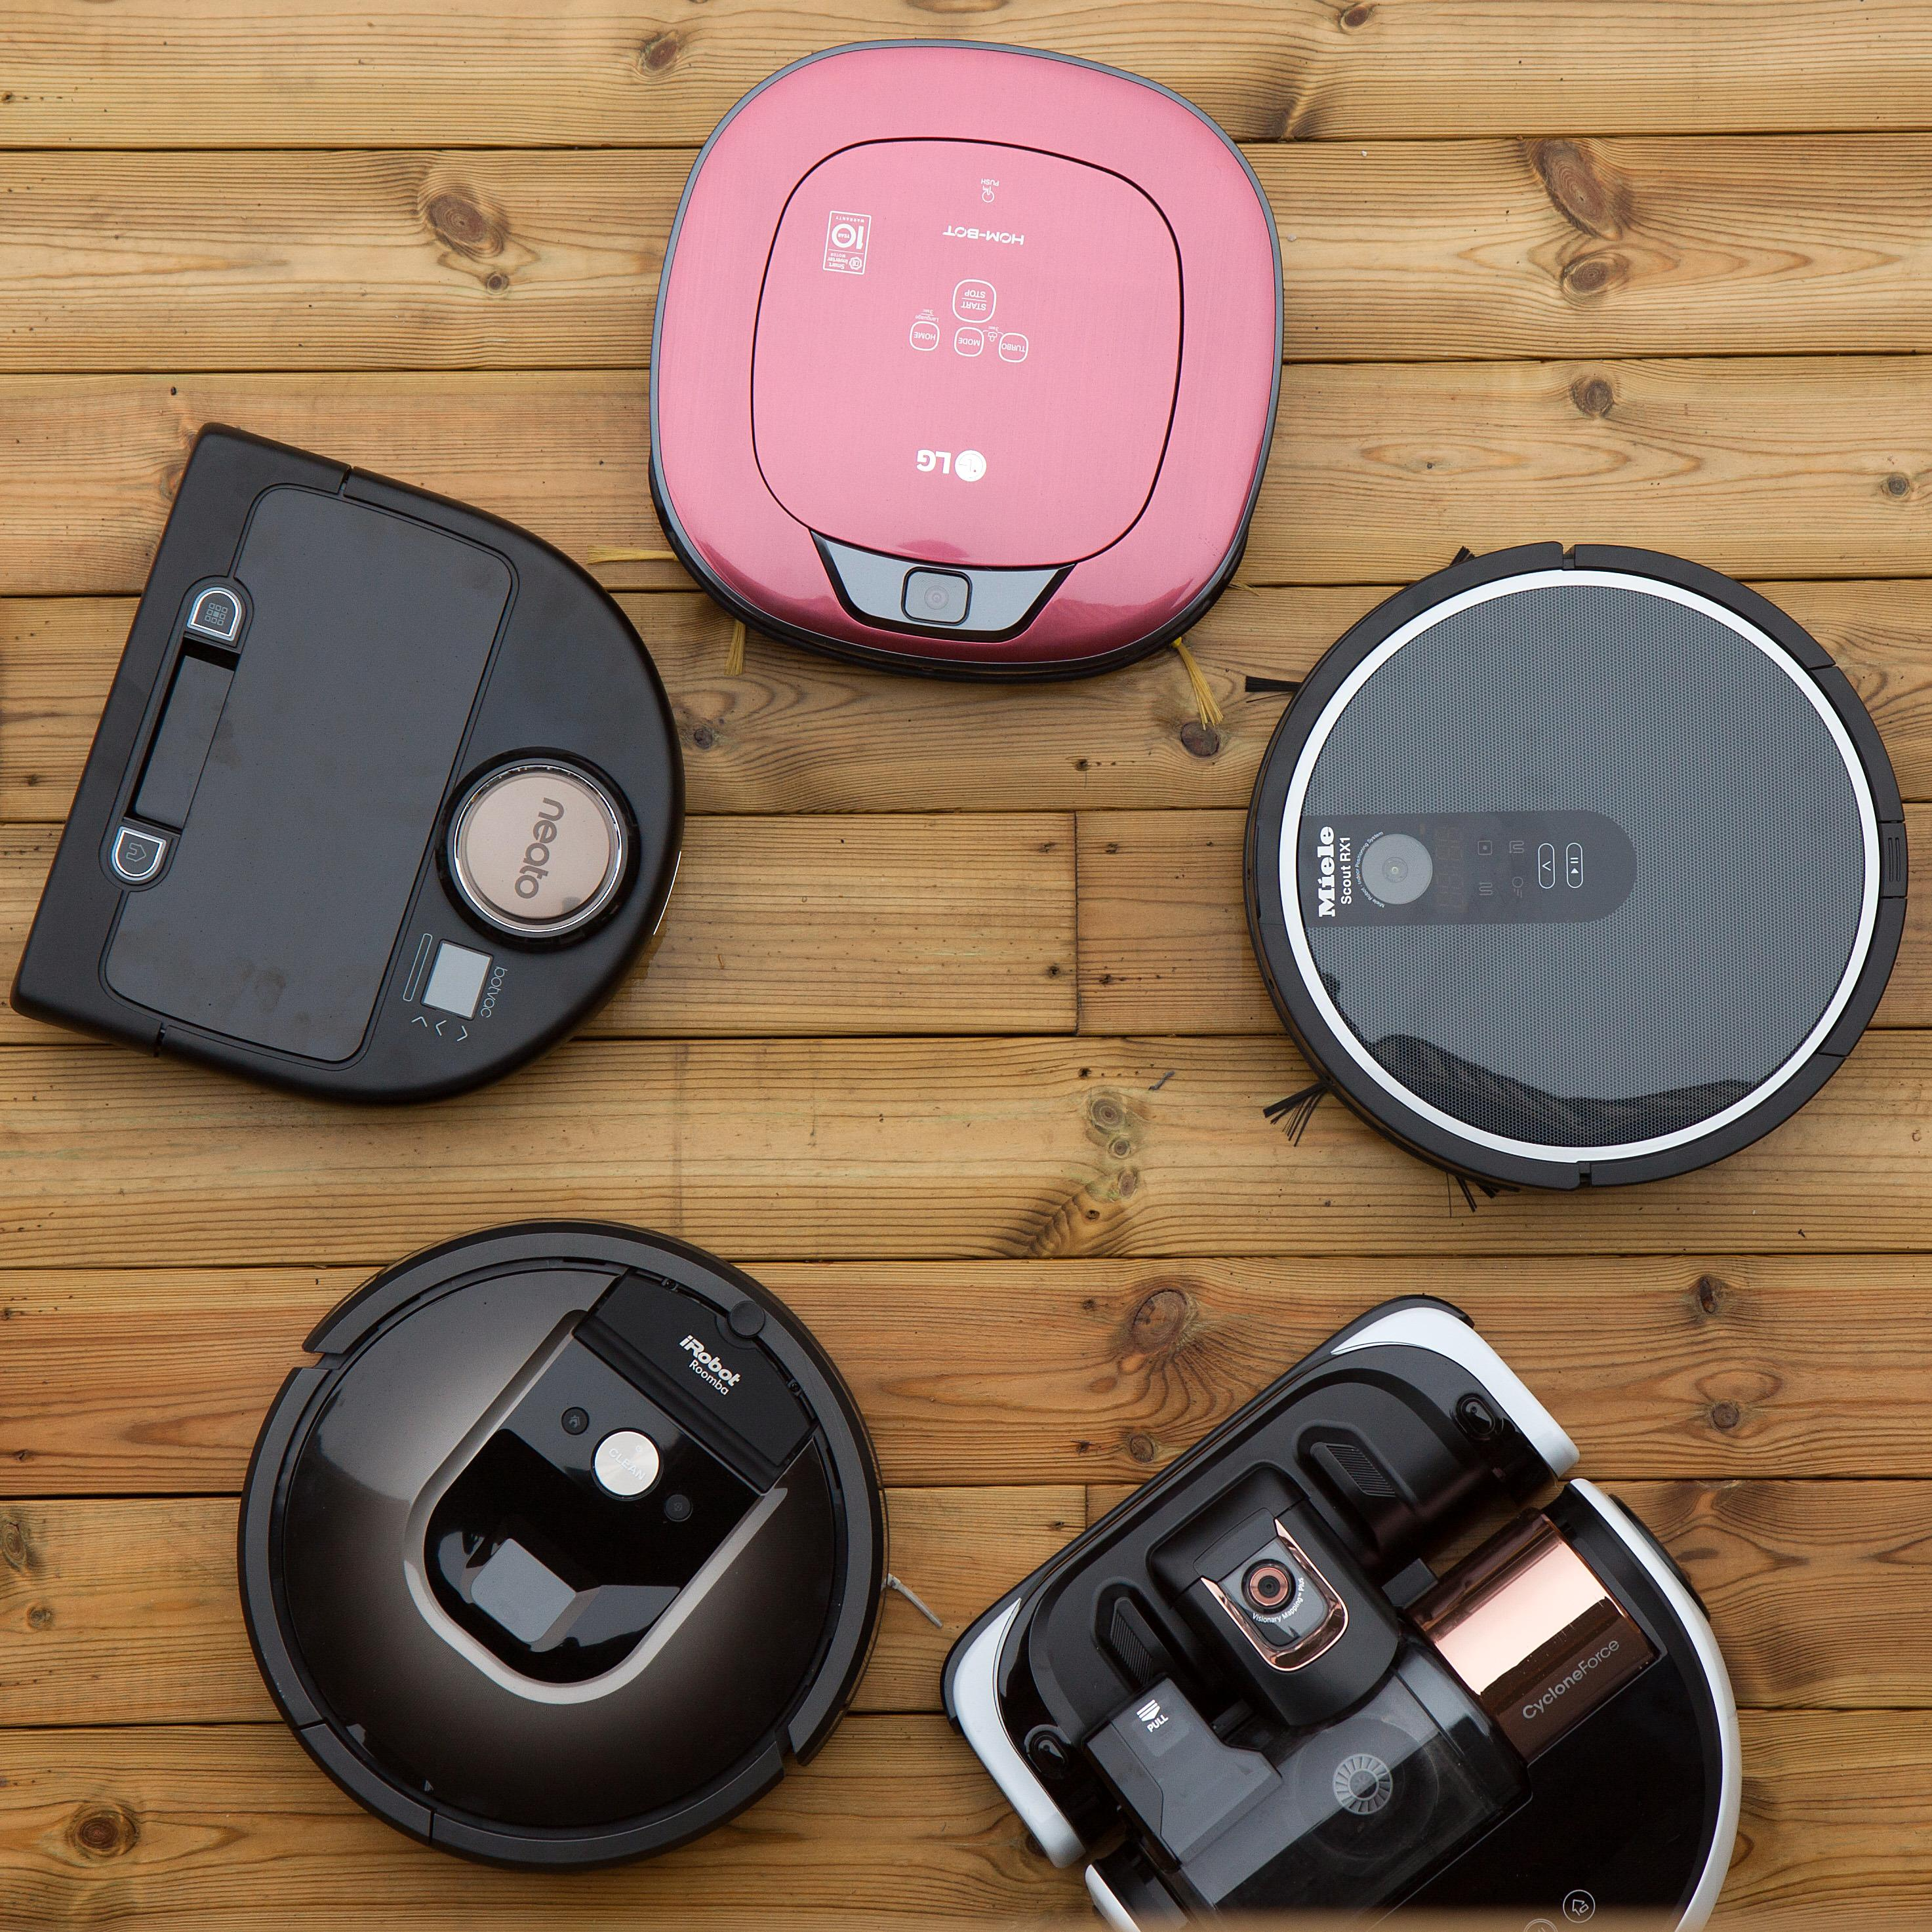 Disse var med. Fra øverst i midten og med klokken: LG Hom-bot, Miele Scout RX1, Samsung Powerbot VR9000, iRobot Roomba 980 og Neato Botvac Connected.